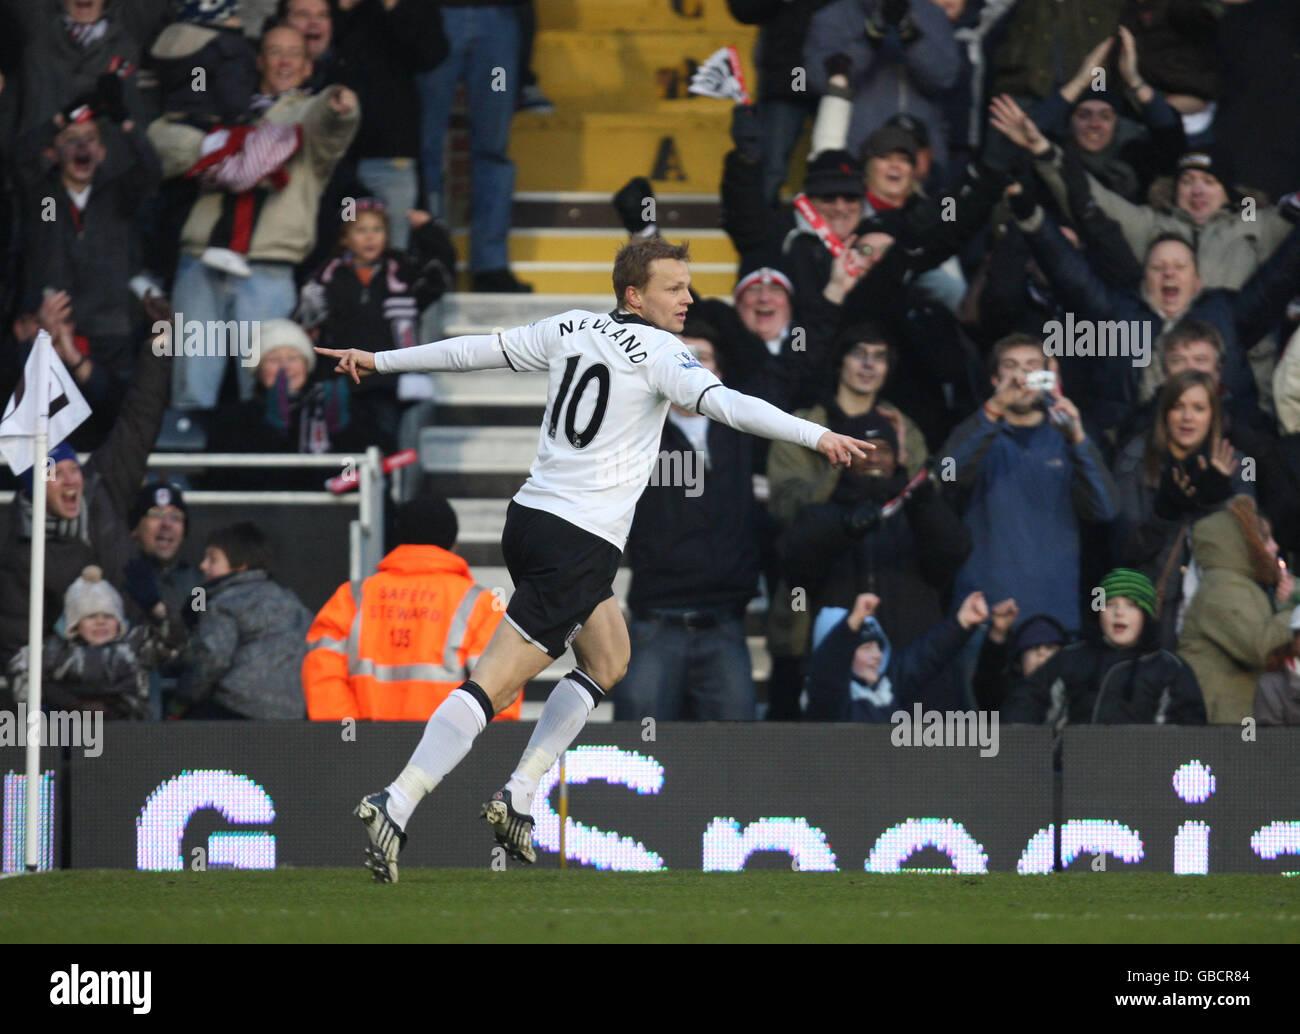 Soccer - Barclays Premier League - Fulham v Portsmouth - Craven Cottage - Stock Image